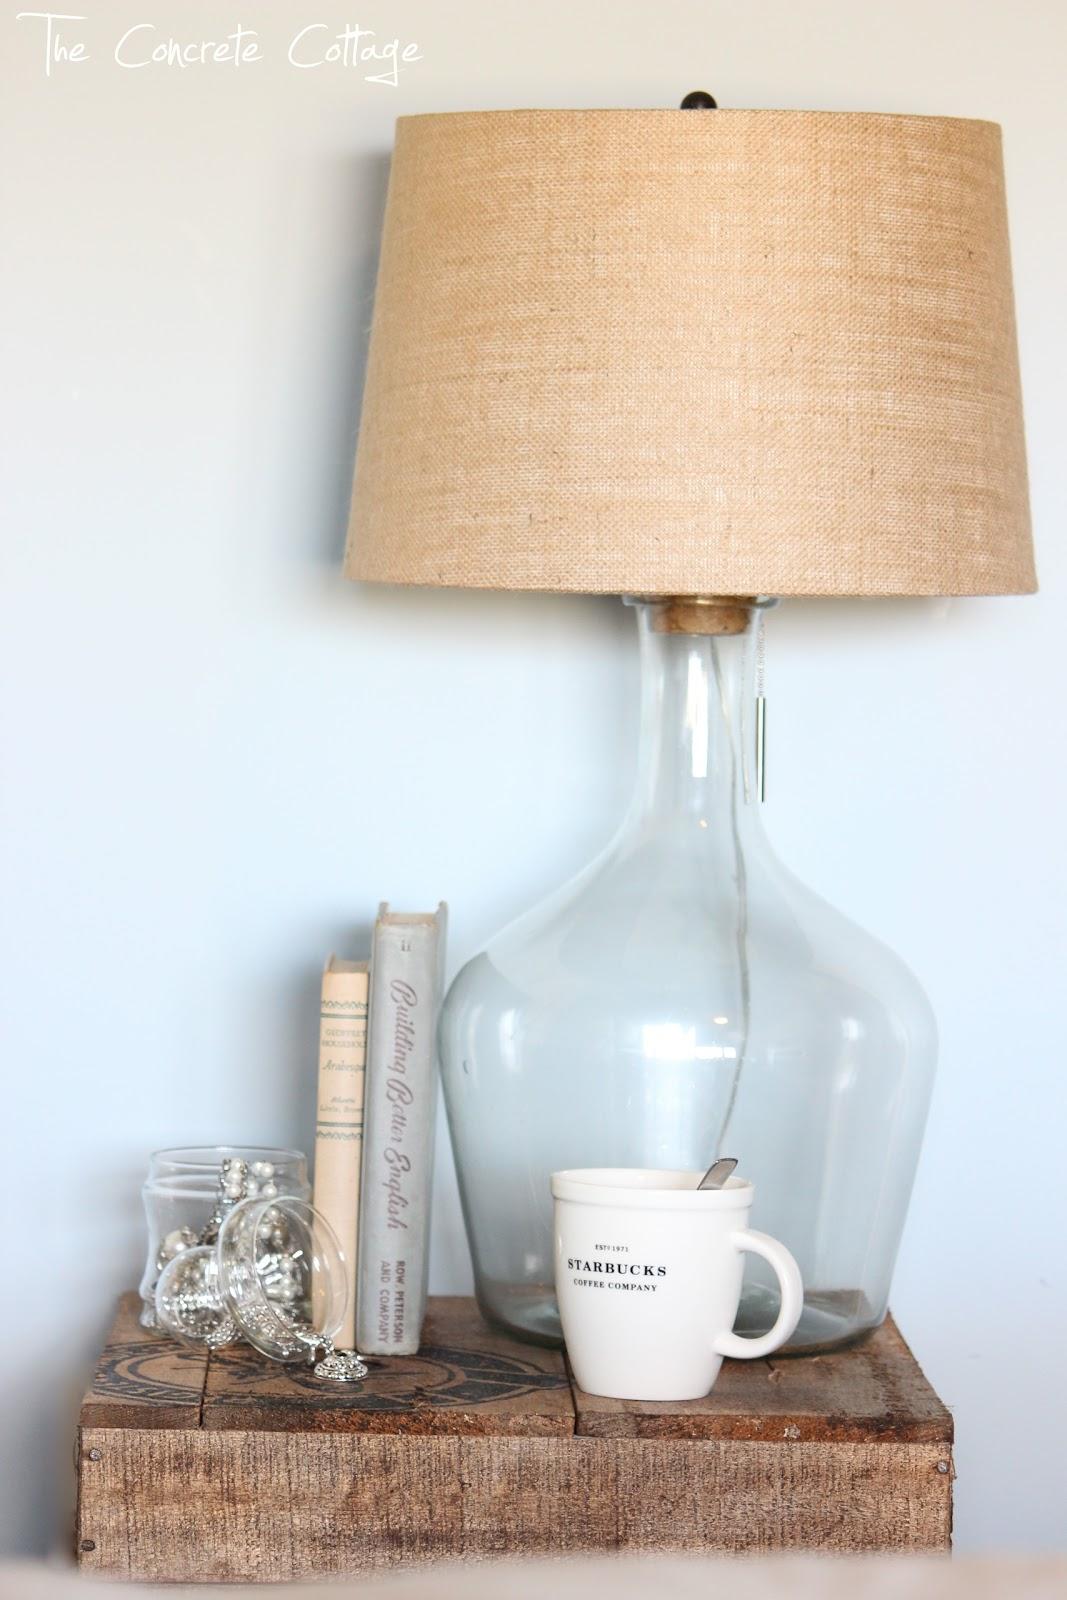 Fantastic The Concrete Cottage: Glass Bottle Lamp ~ DIY Pottery Barn Knock Off OB73